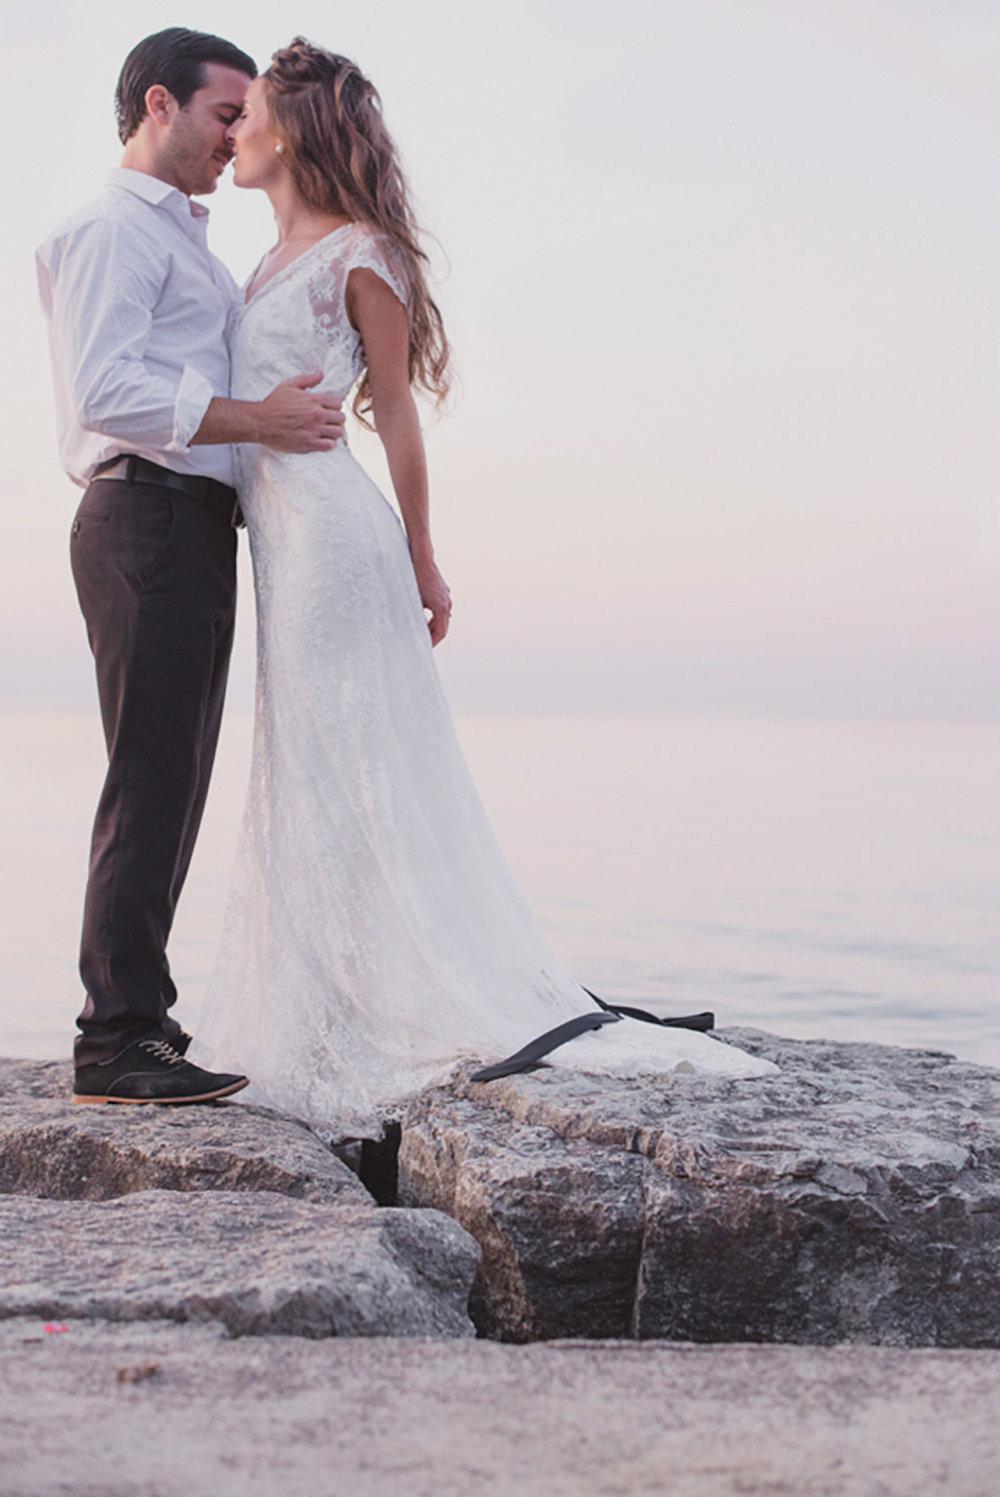 Grimbsy-Beach-Editorial-Vineyard-Bride-photo-by-Destiny-Dawn-Photography-026.JPG